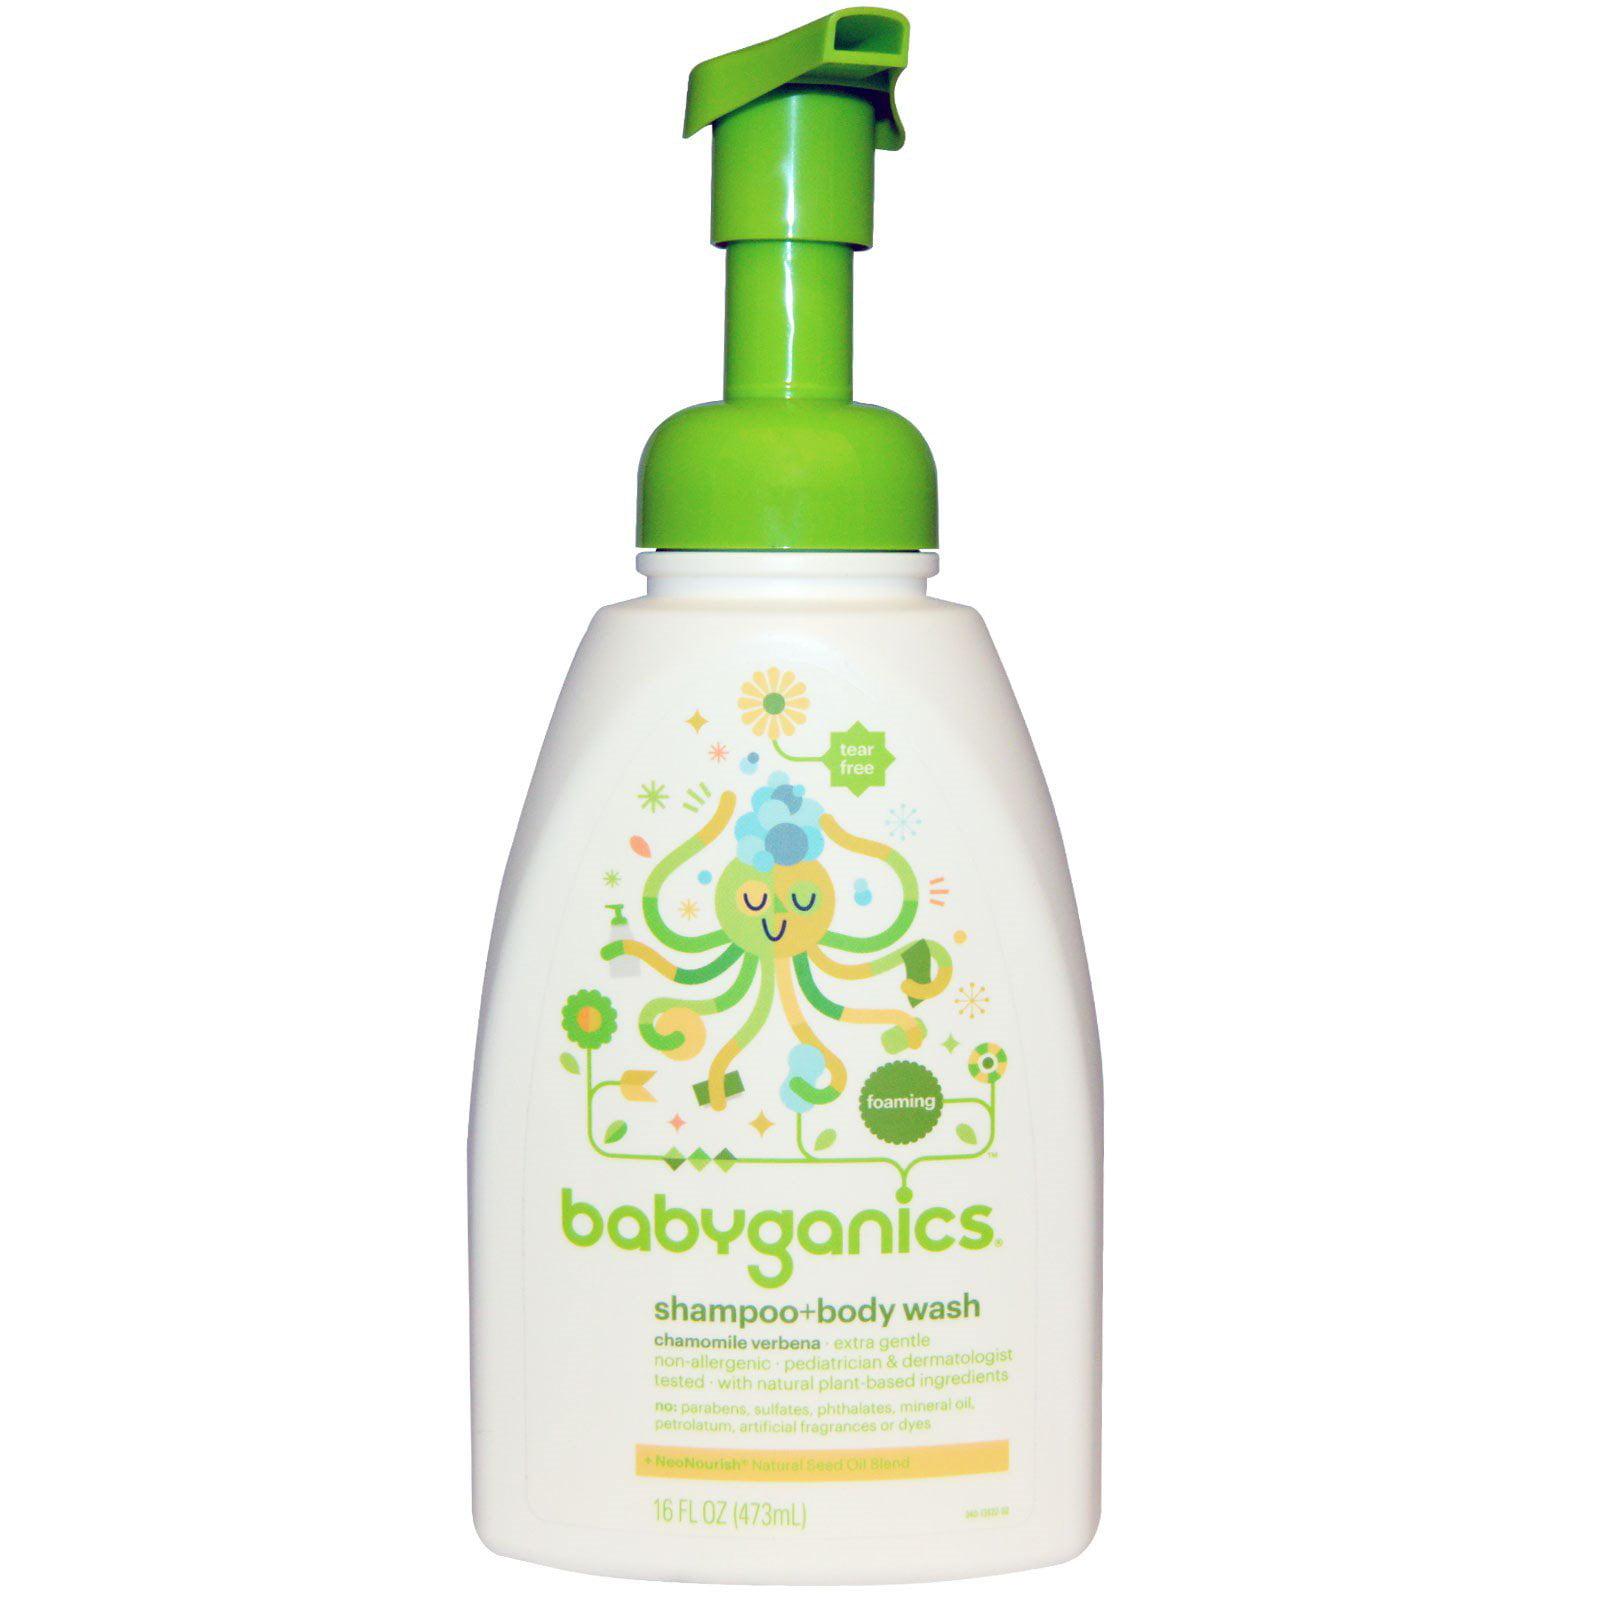 BabyGanics, Shampoo + Bodywash, Chamomile Verbena, 16 fl oz (pack of 2) by BabyGanics